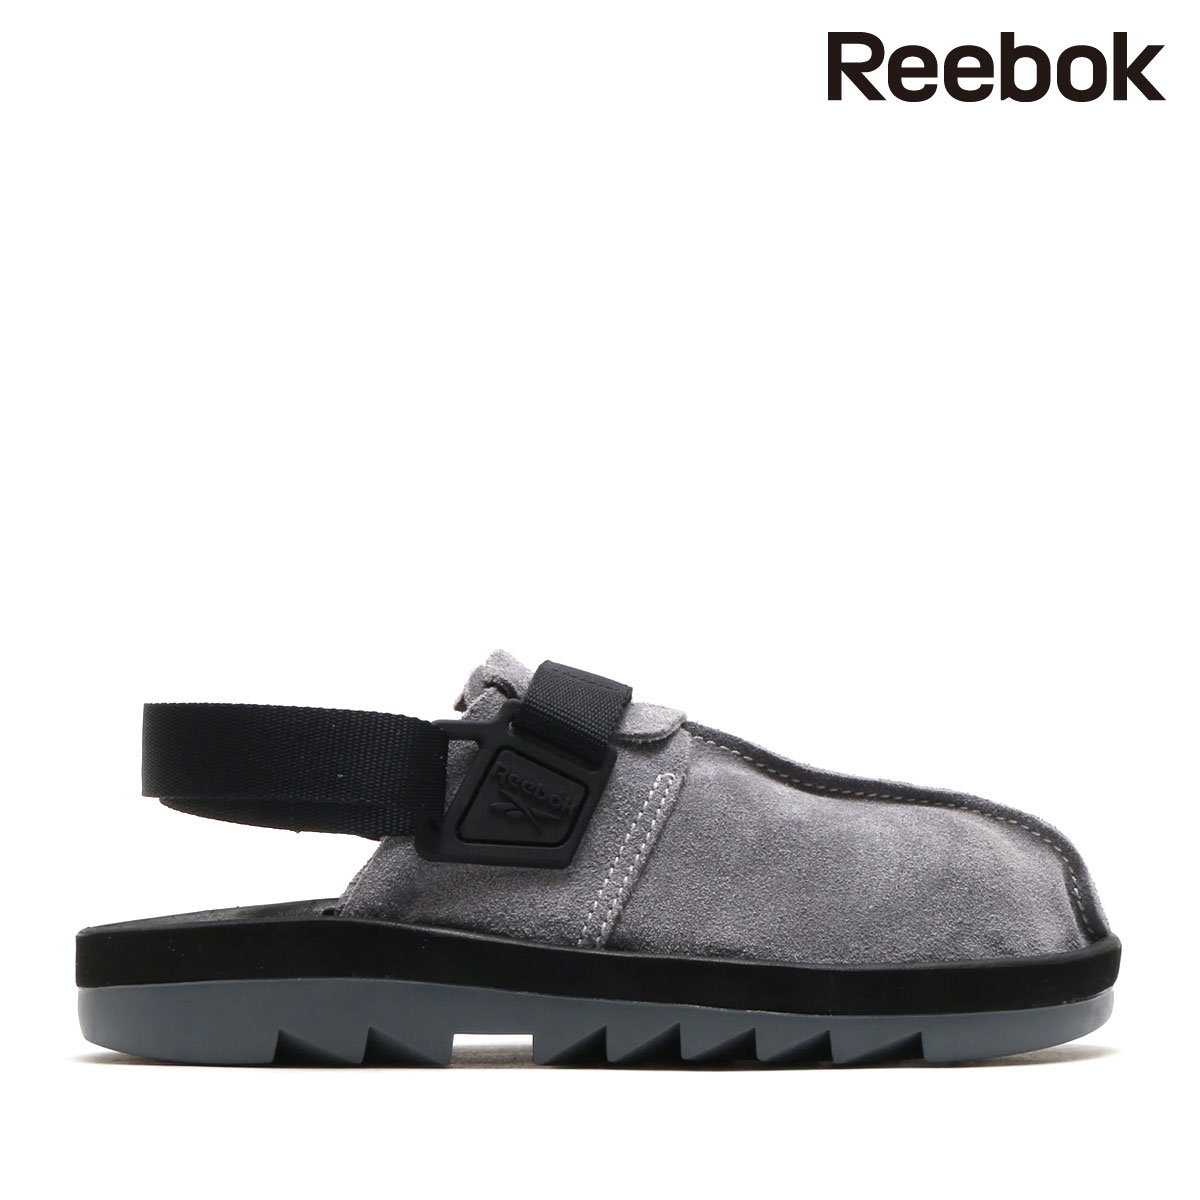 Reebok BEATNIK(AROI/BLACK/STEEL)(リーボック ビートニック)【メンズ】【レディース】【サンダル】【18SS-I】